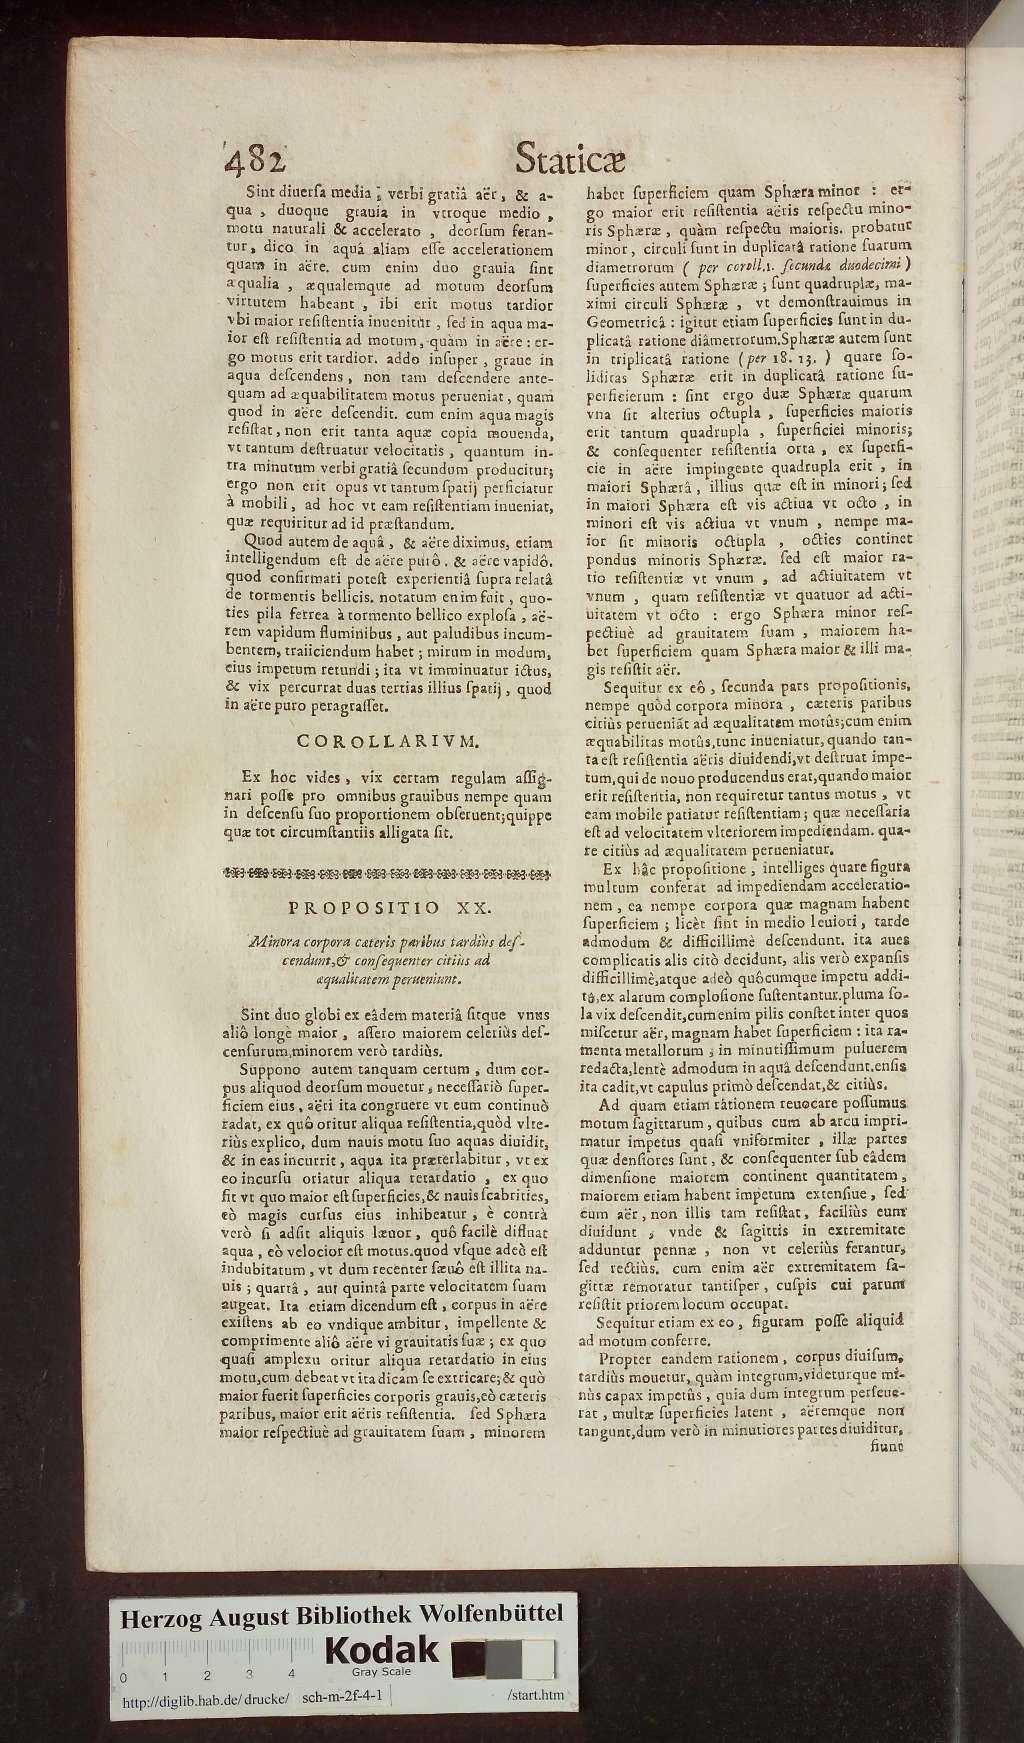 http://diglib.hab.de/drucke/sch-m-2f-4-1/00526.jpg